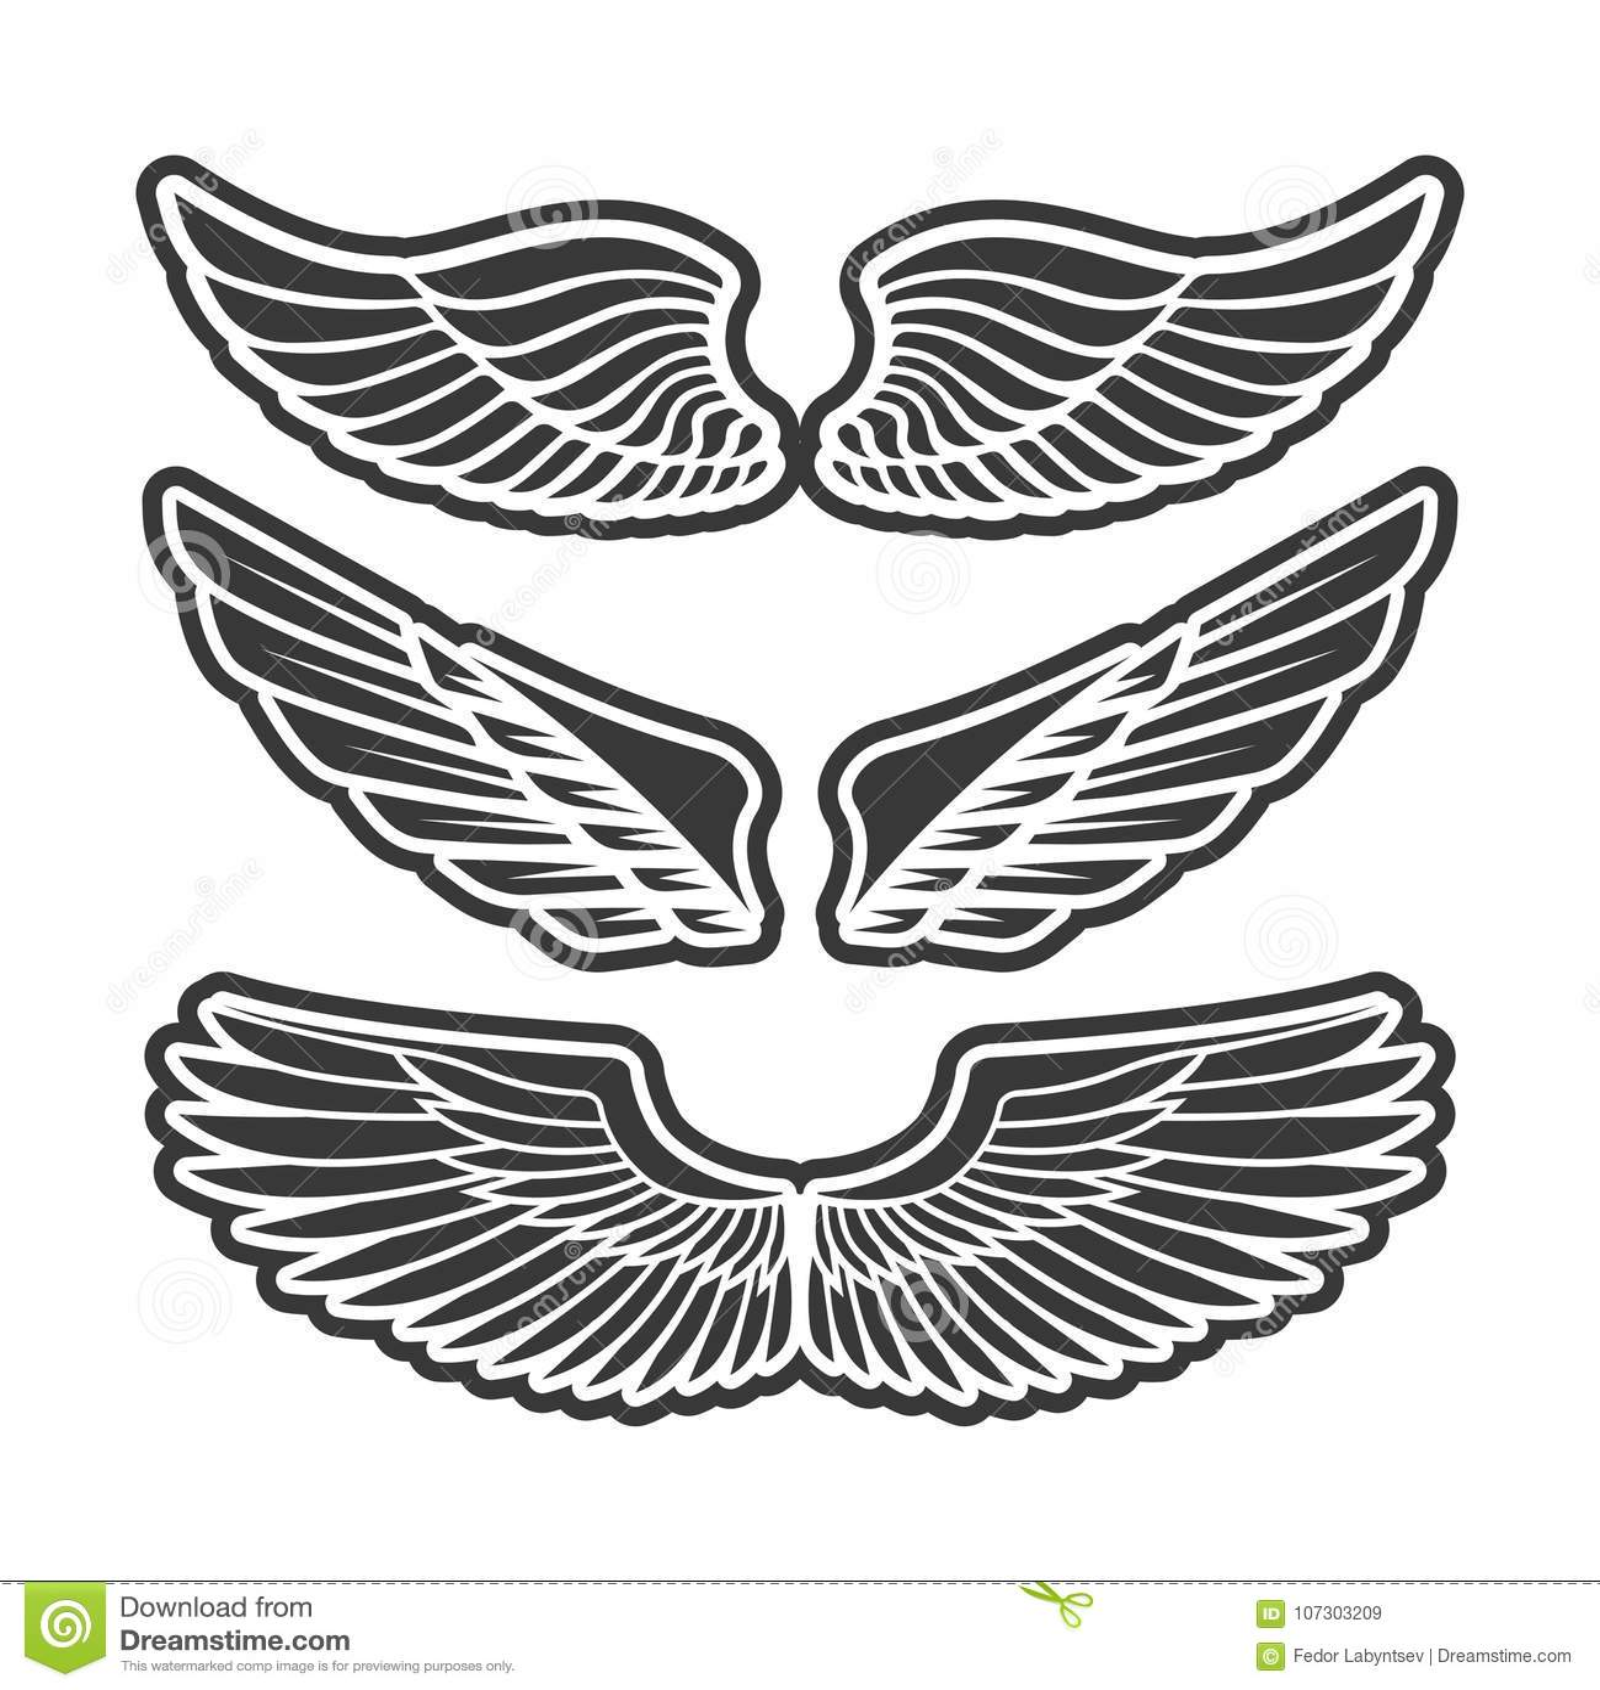 Wings For Heraldry Tattoos Logos Stock Vector Illustration Of